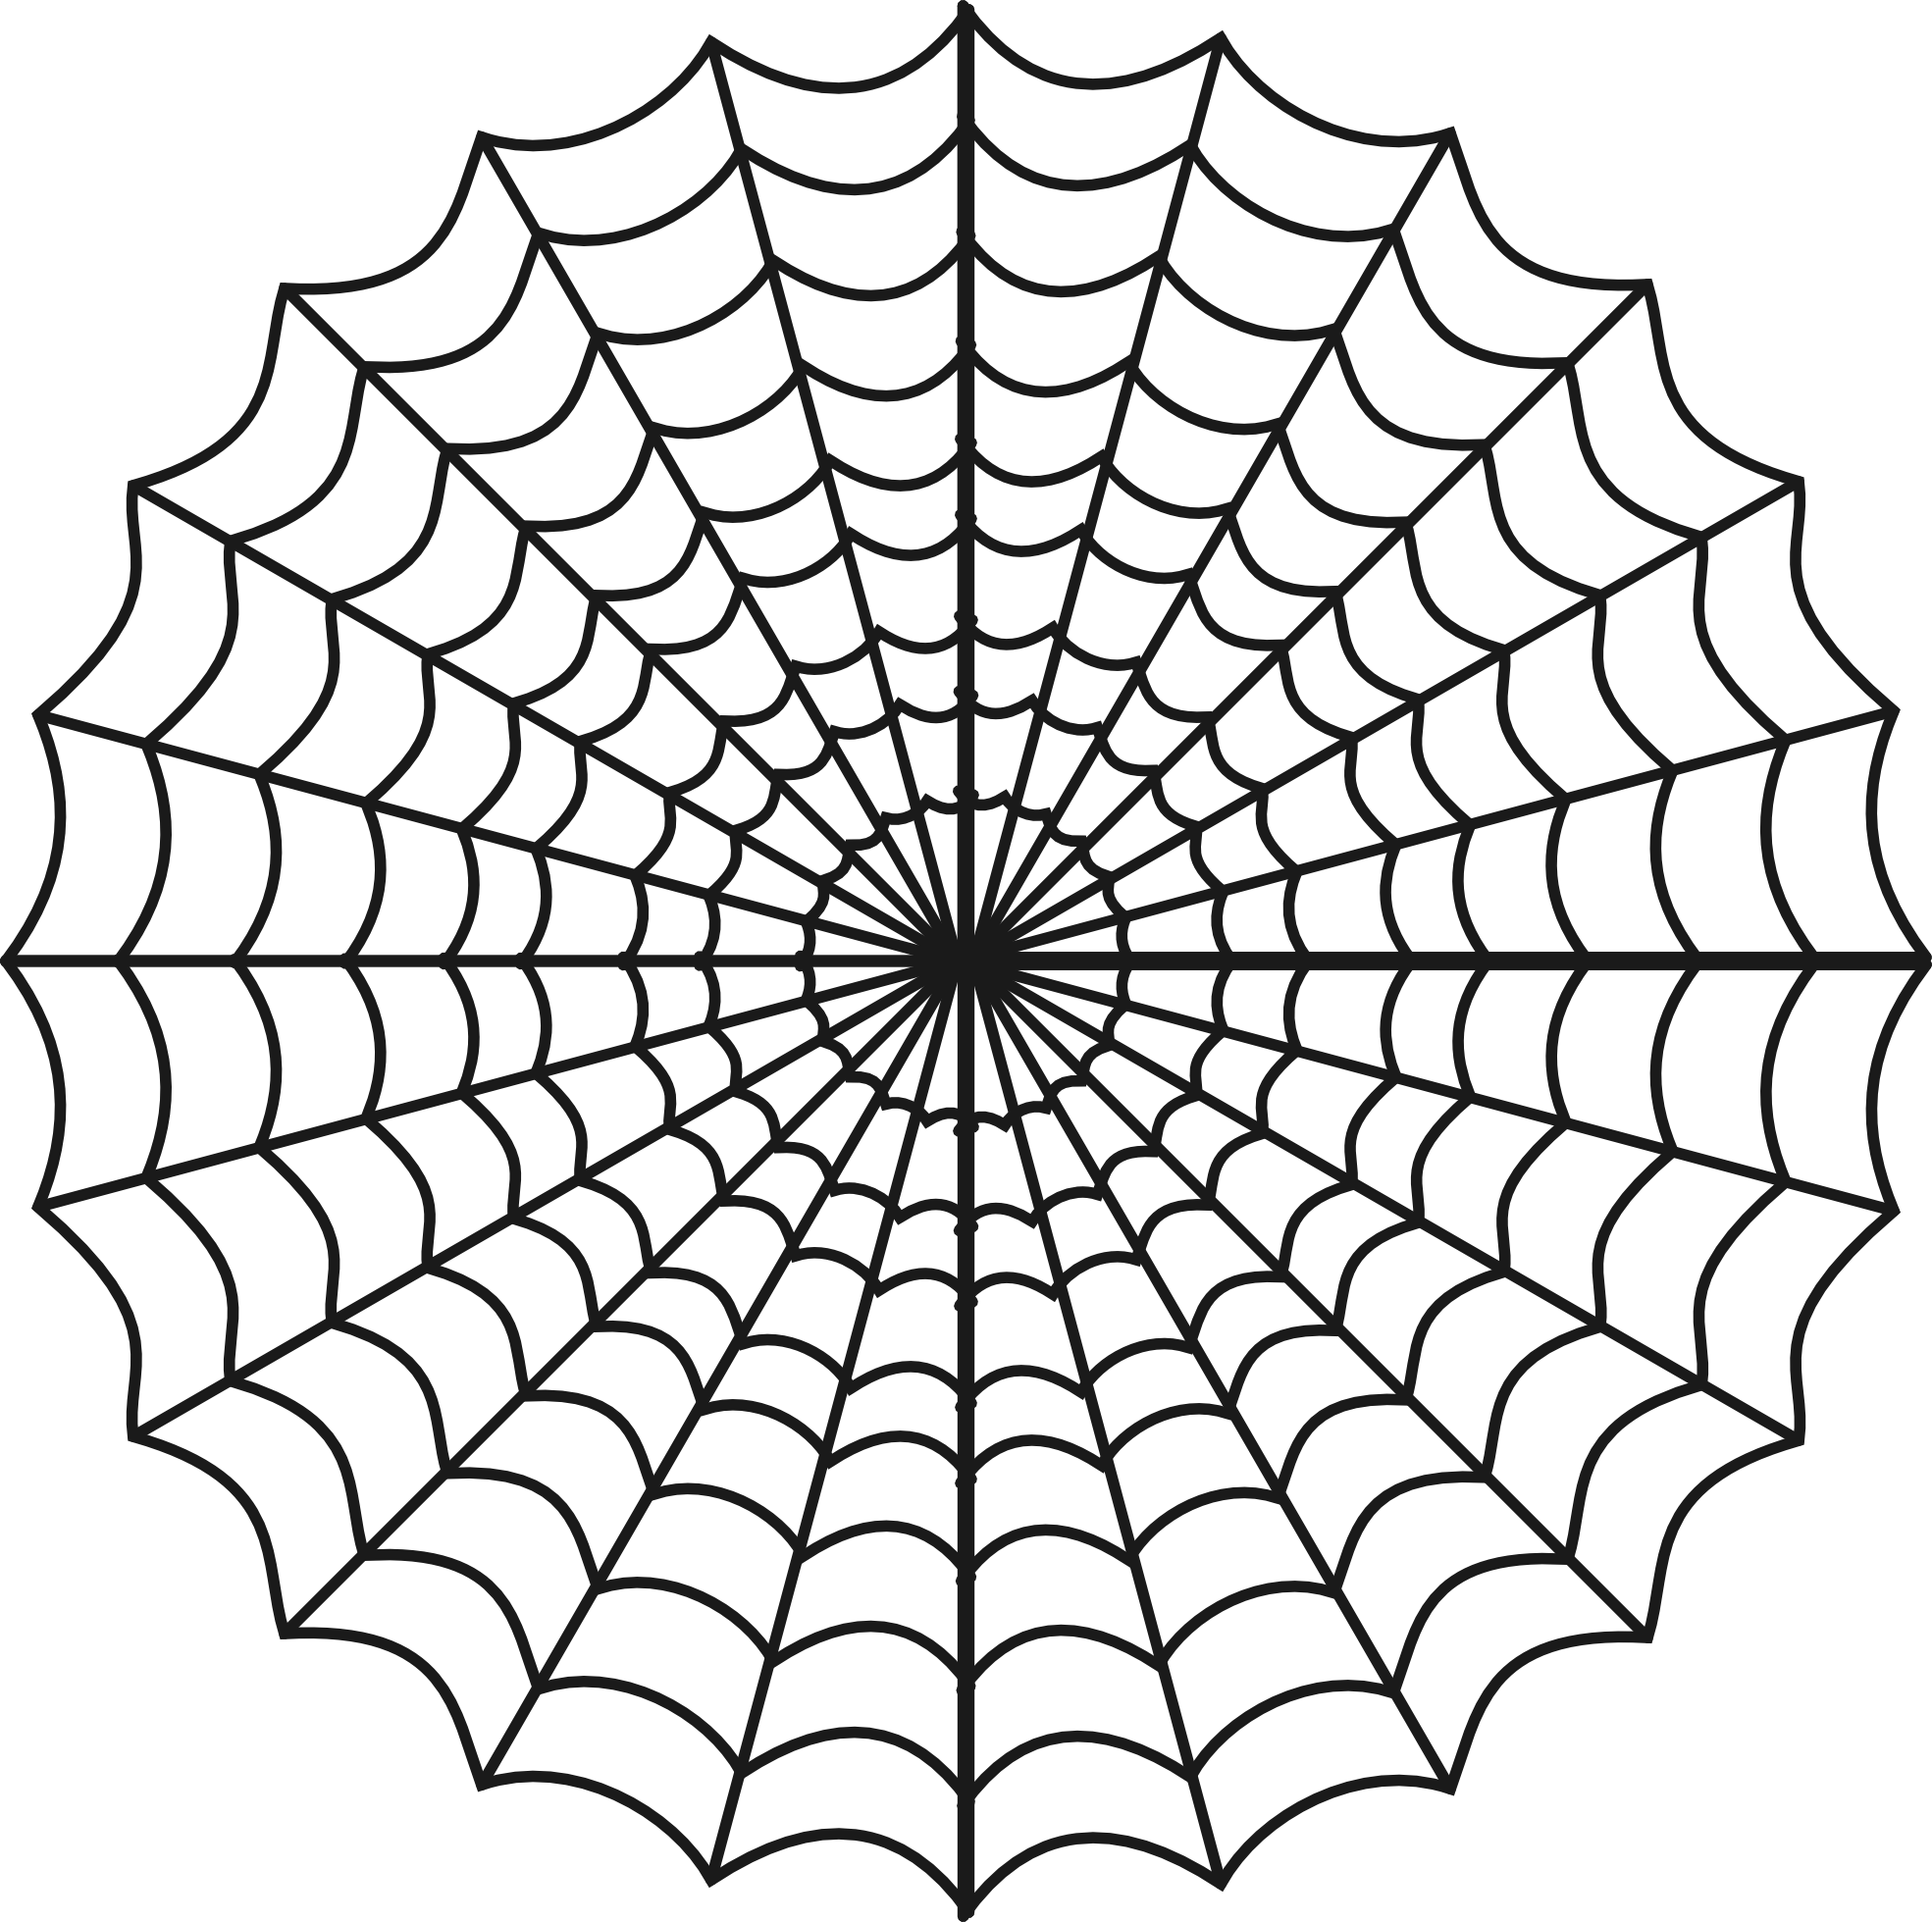 1969x1959 Pattern Clipart Spider Web